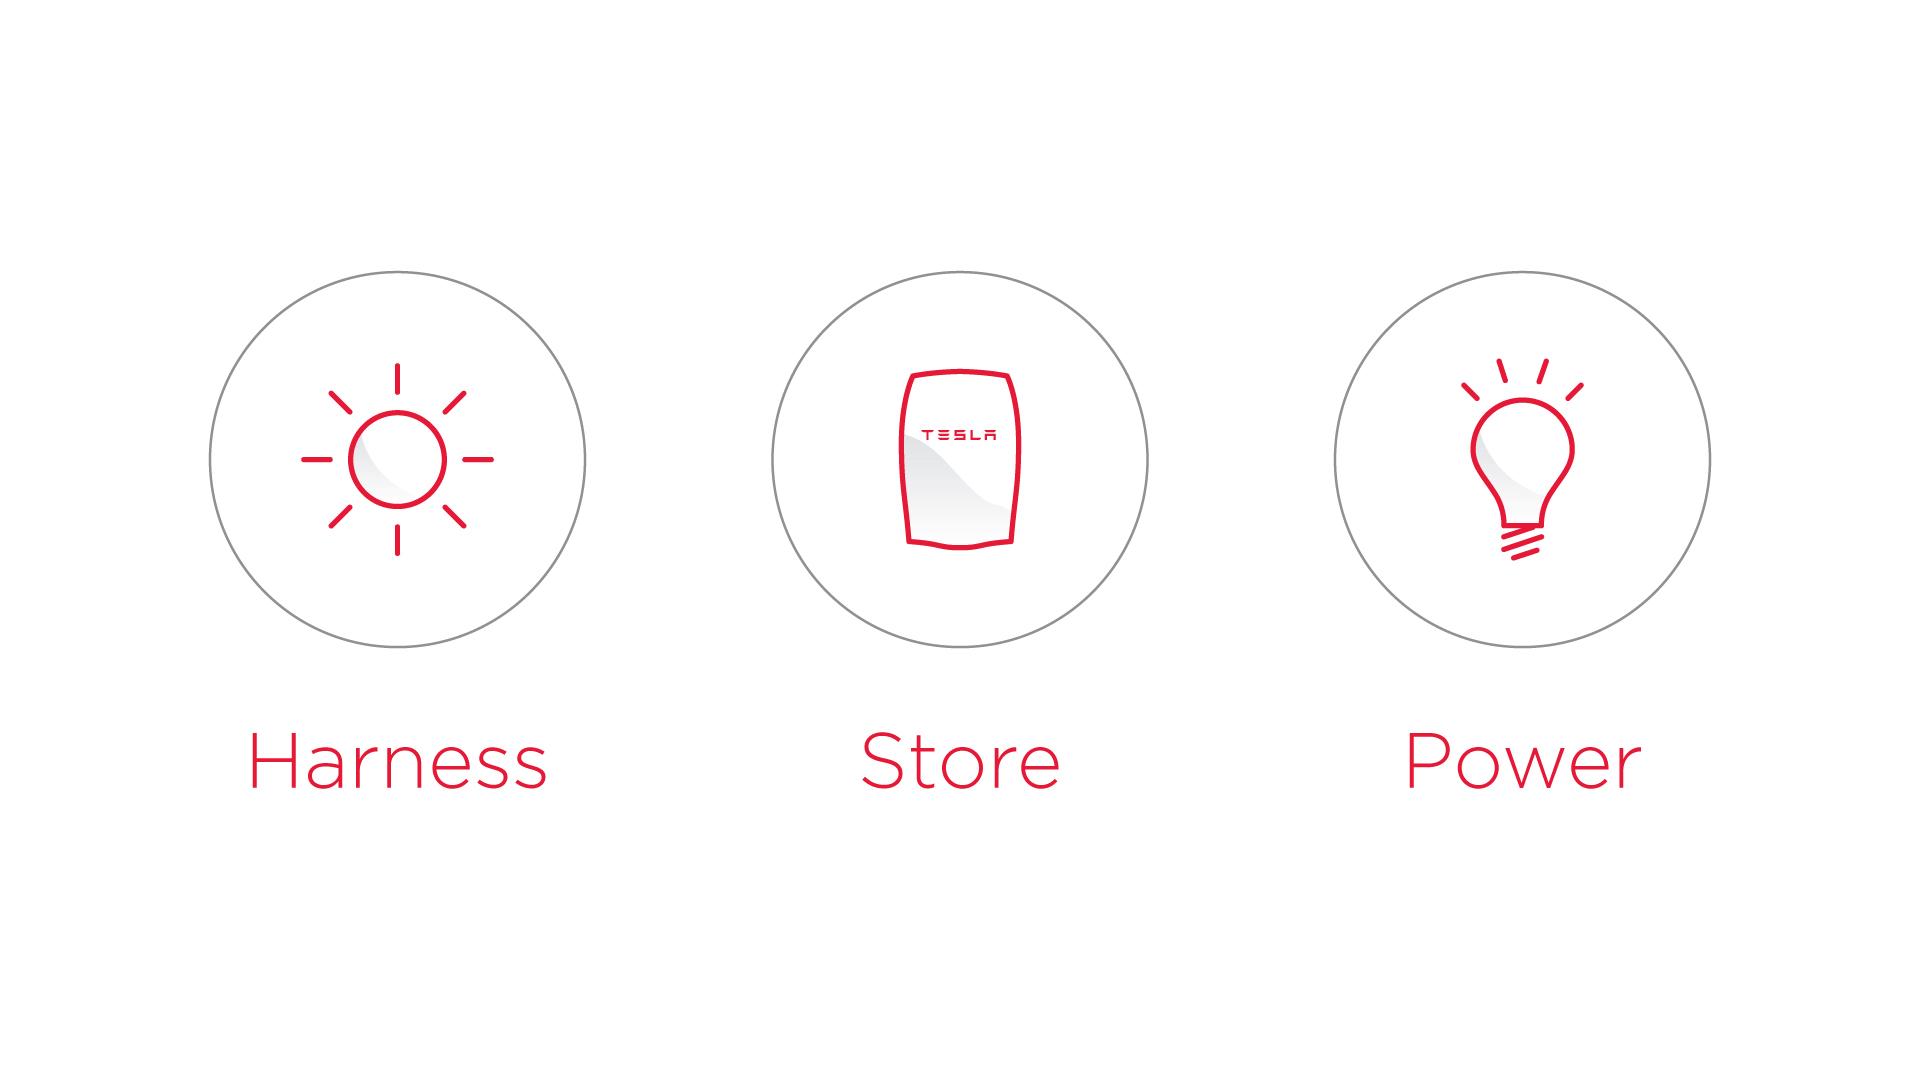 Harness-Store-Power.jpg